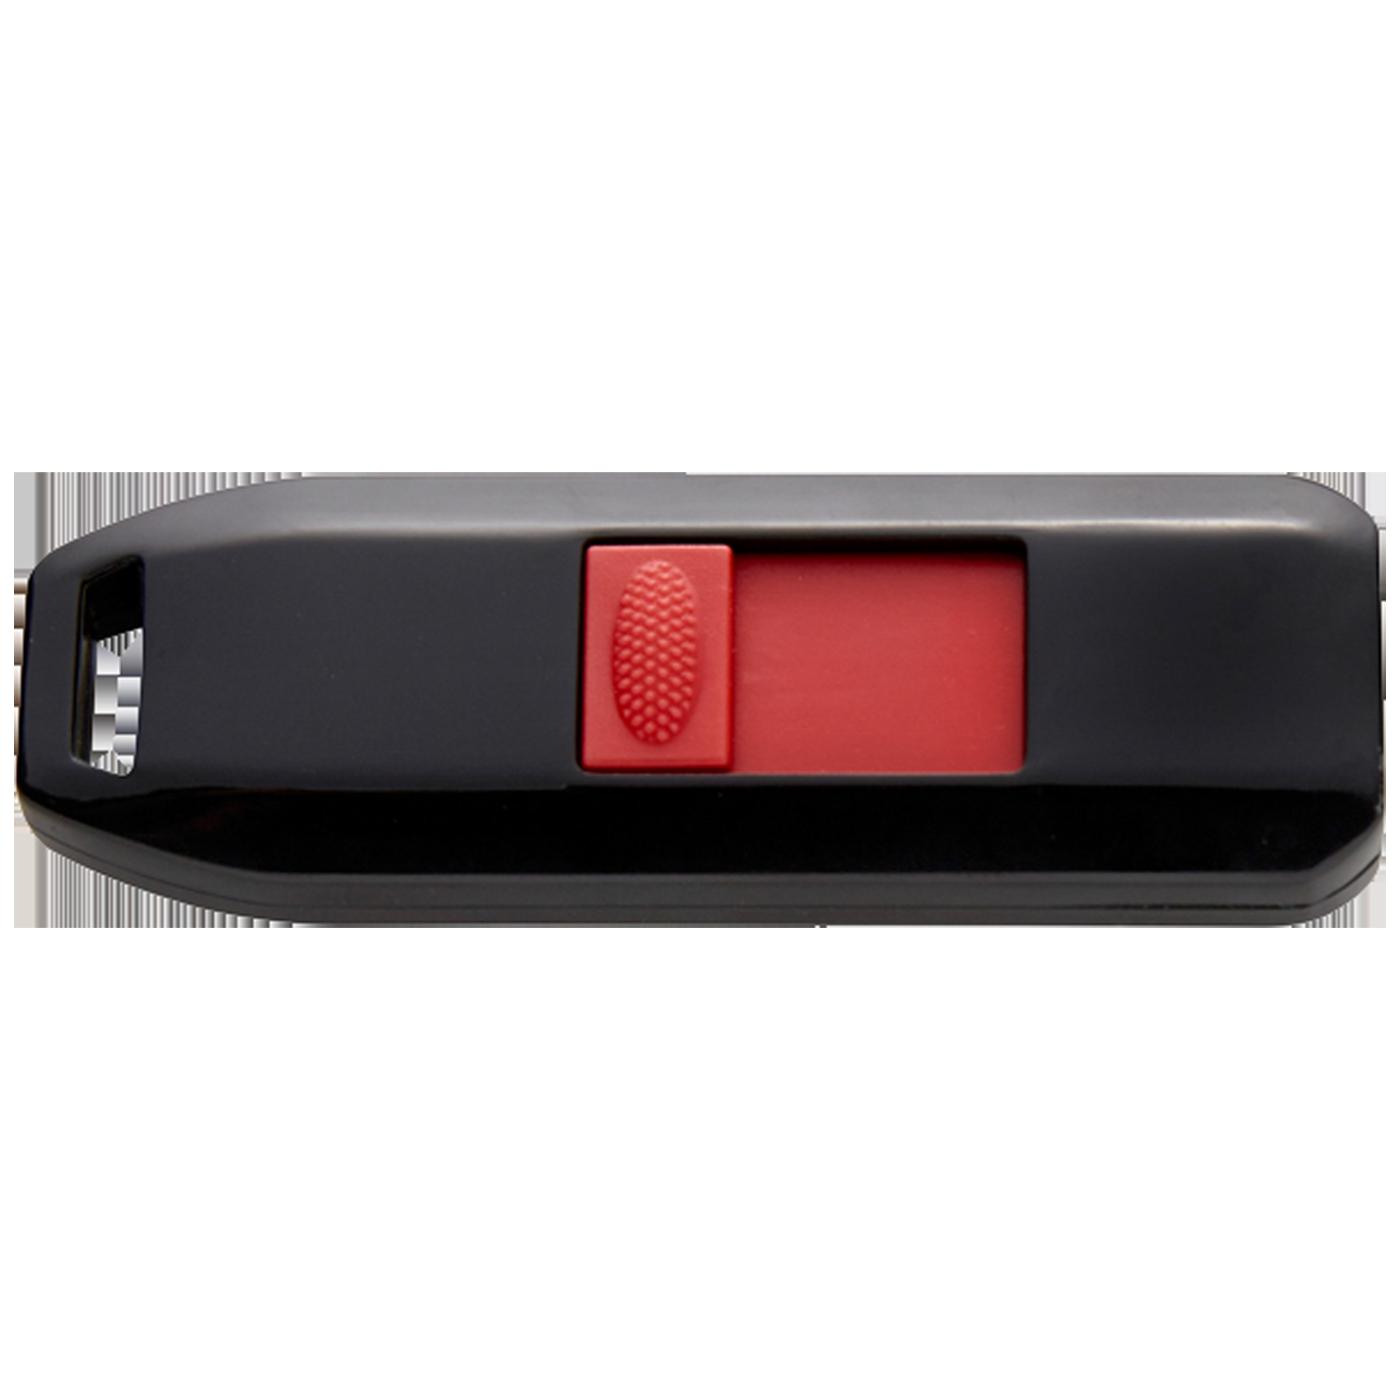 USB Flash Drive 32GB Hi-Speed, Business Line, crno/crveni